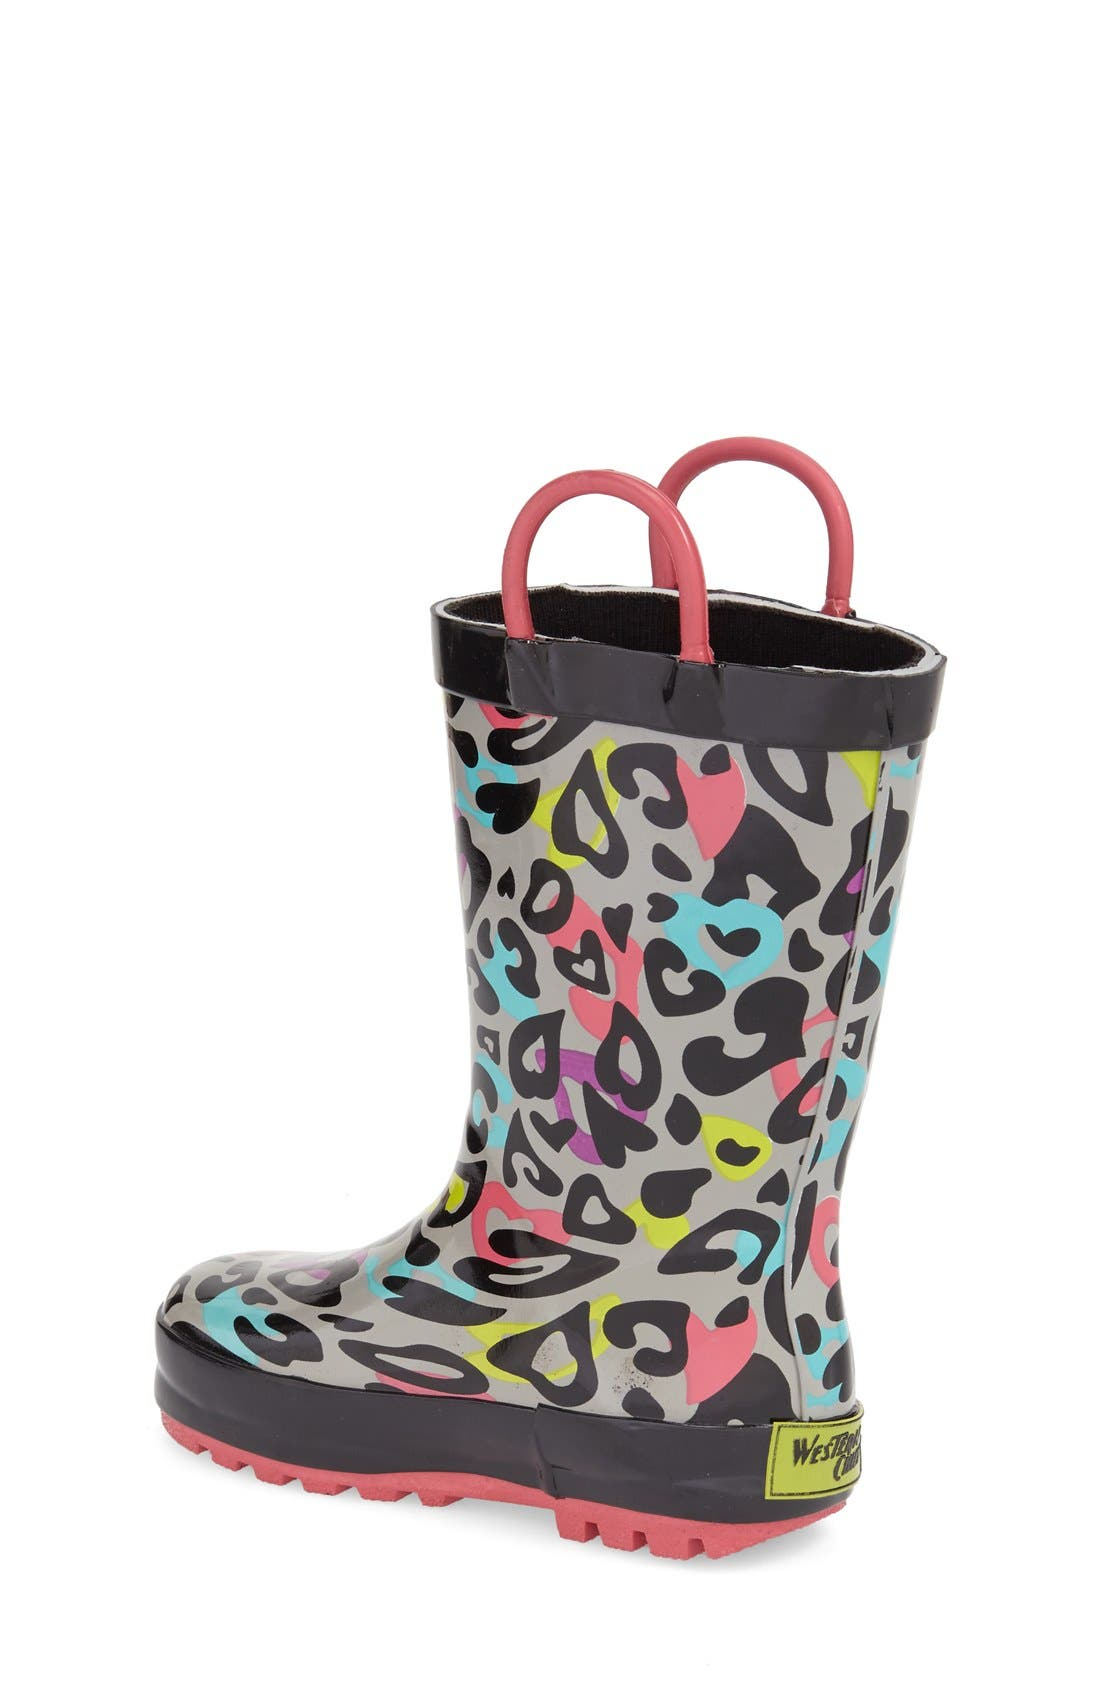 Groovy Leopard Rain Boot,                             Alternate thumbnail 2, color,                             BLACK